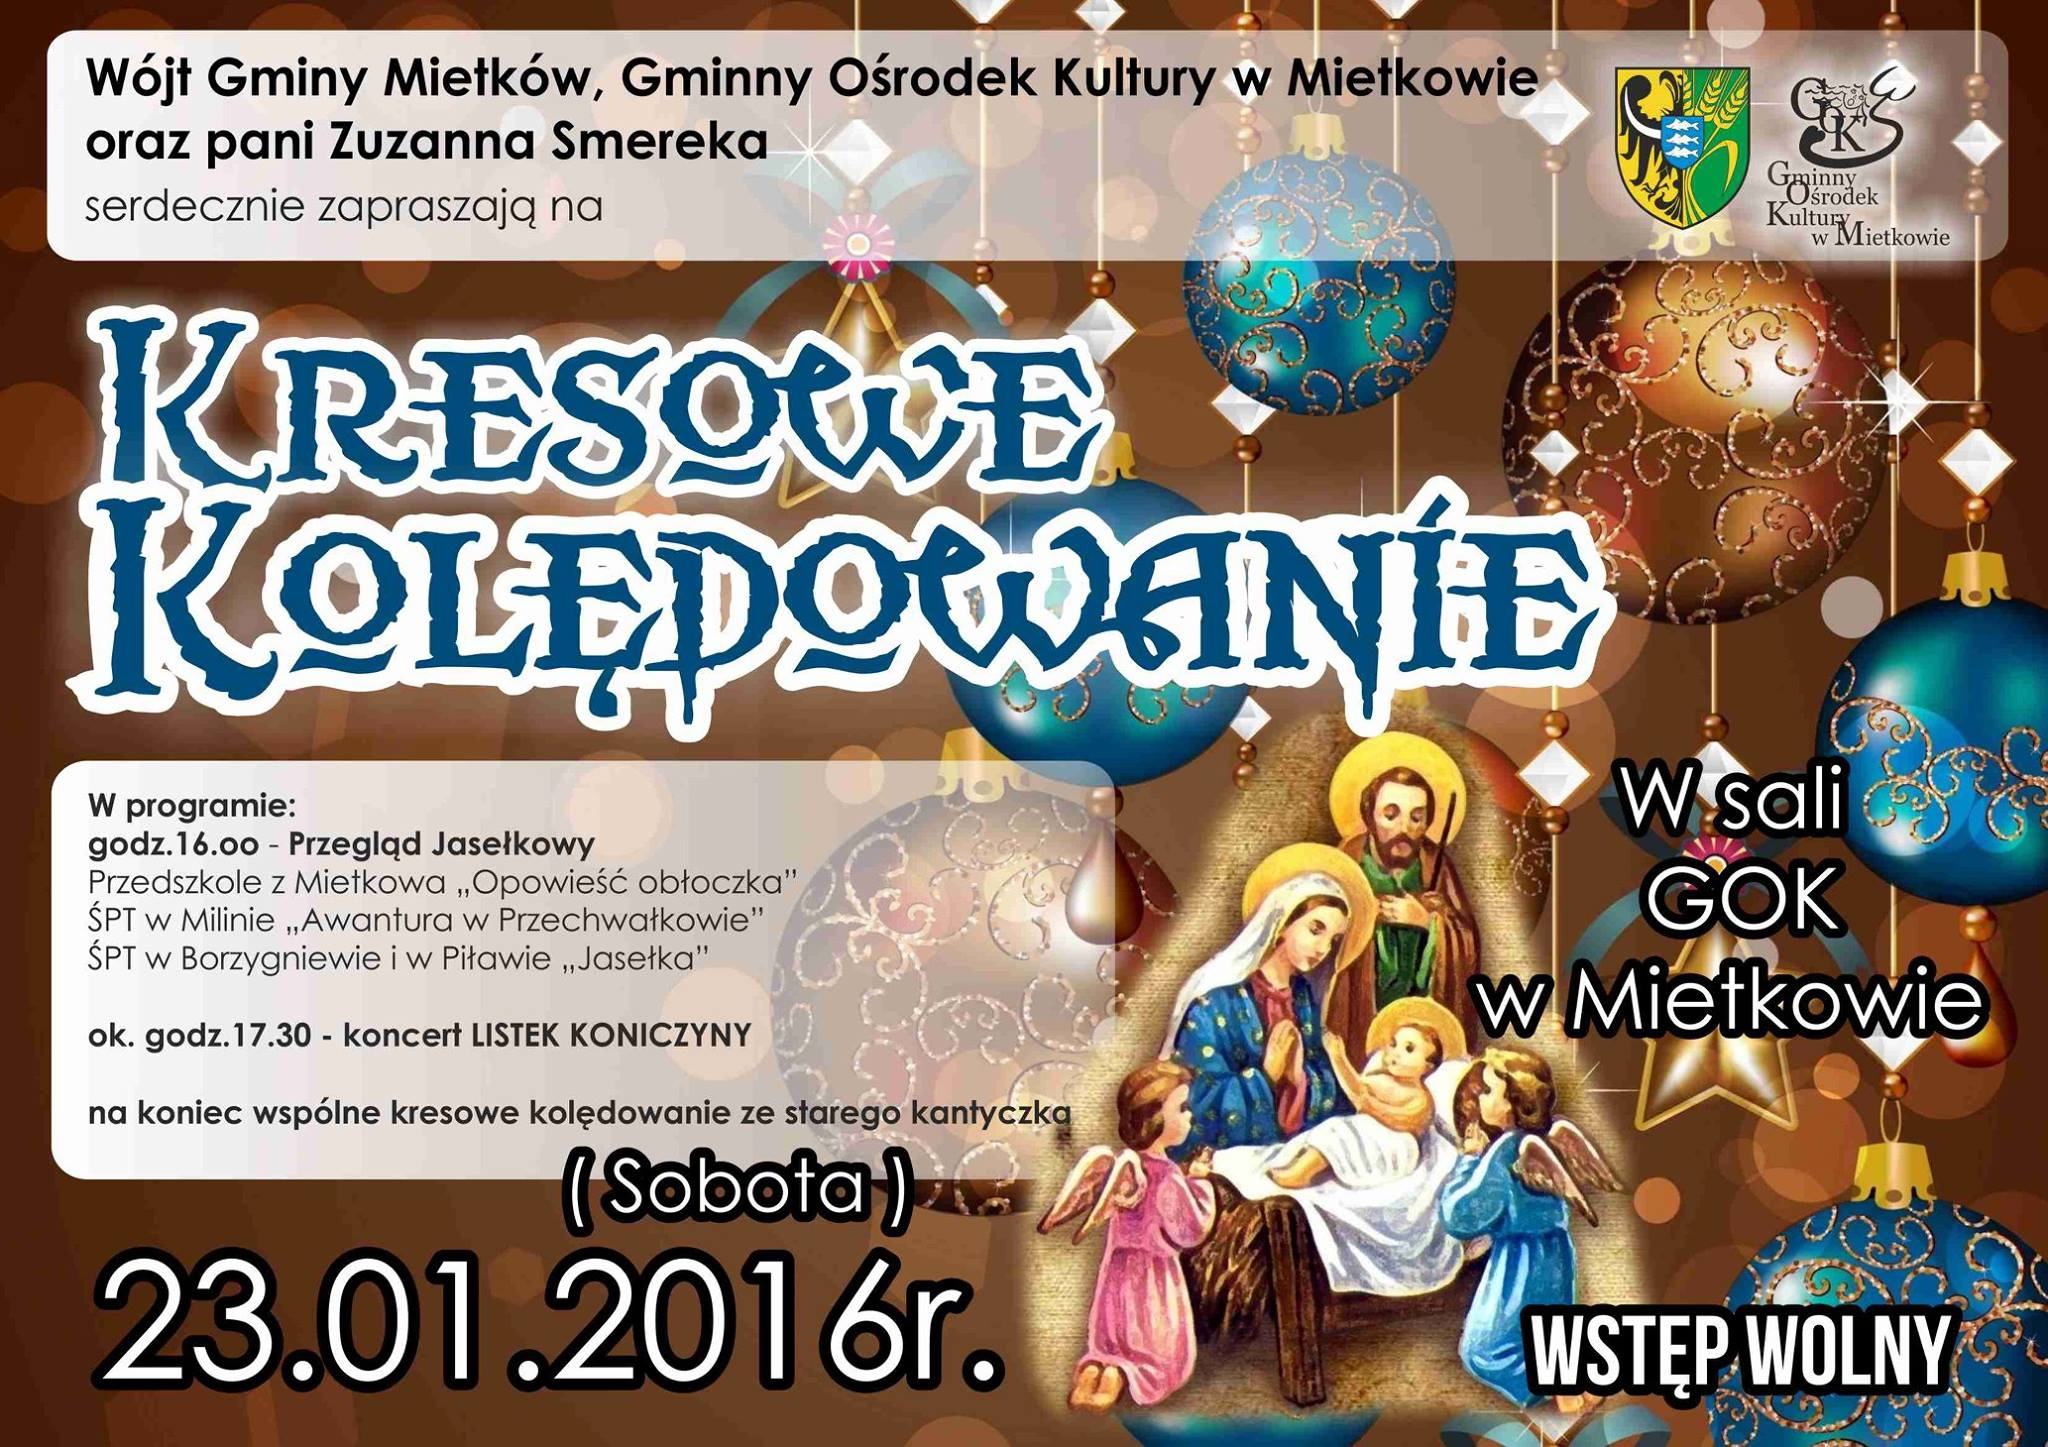 koledowane_kresowe